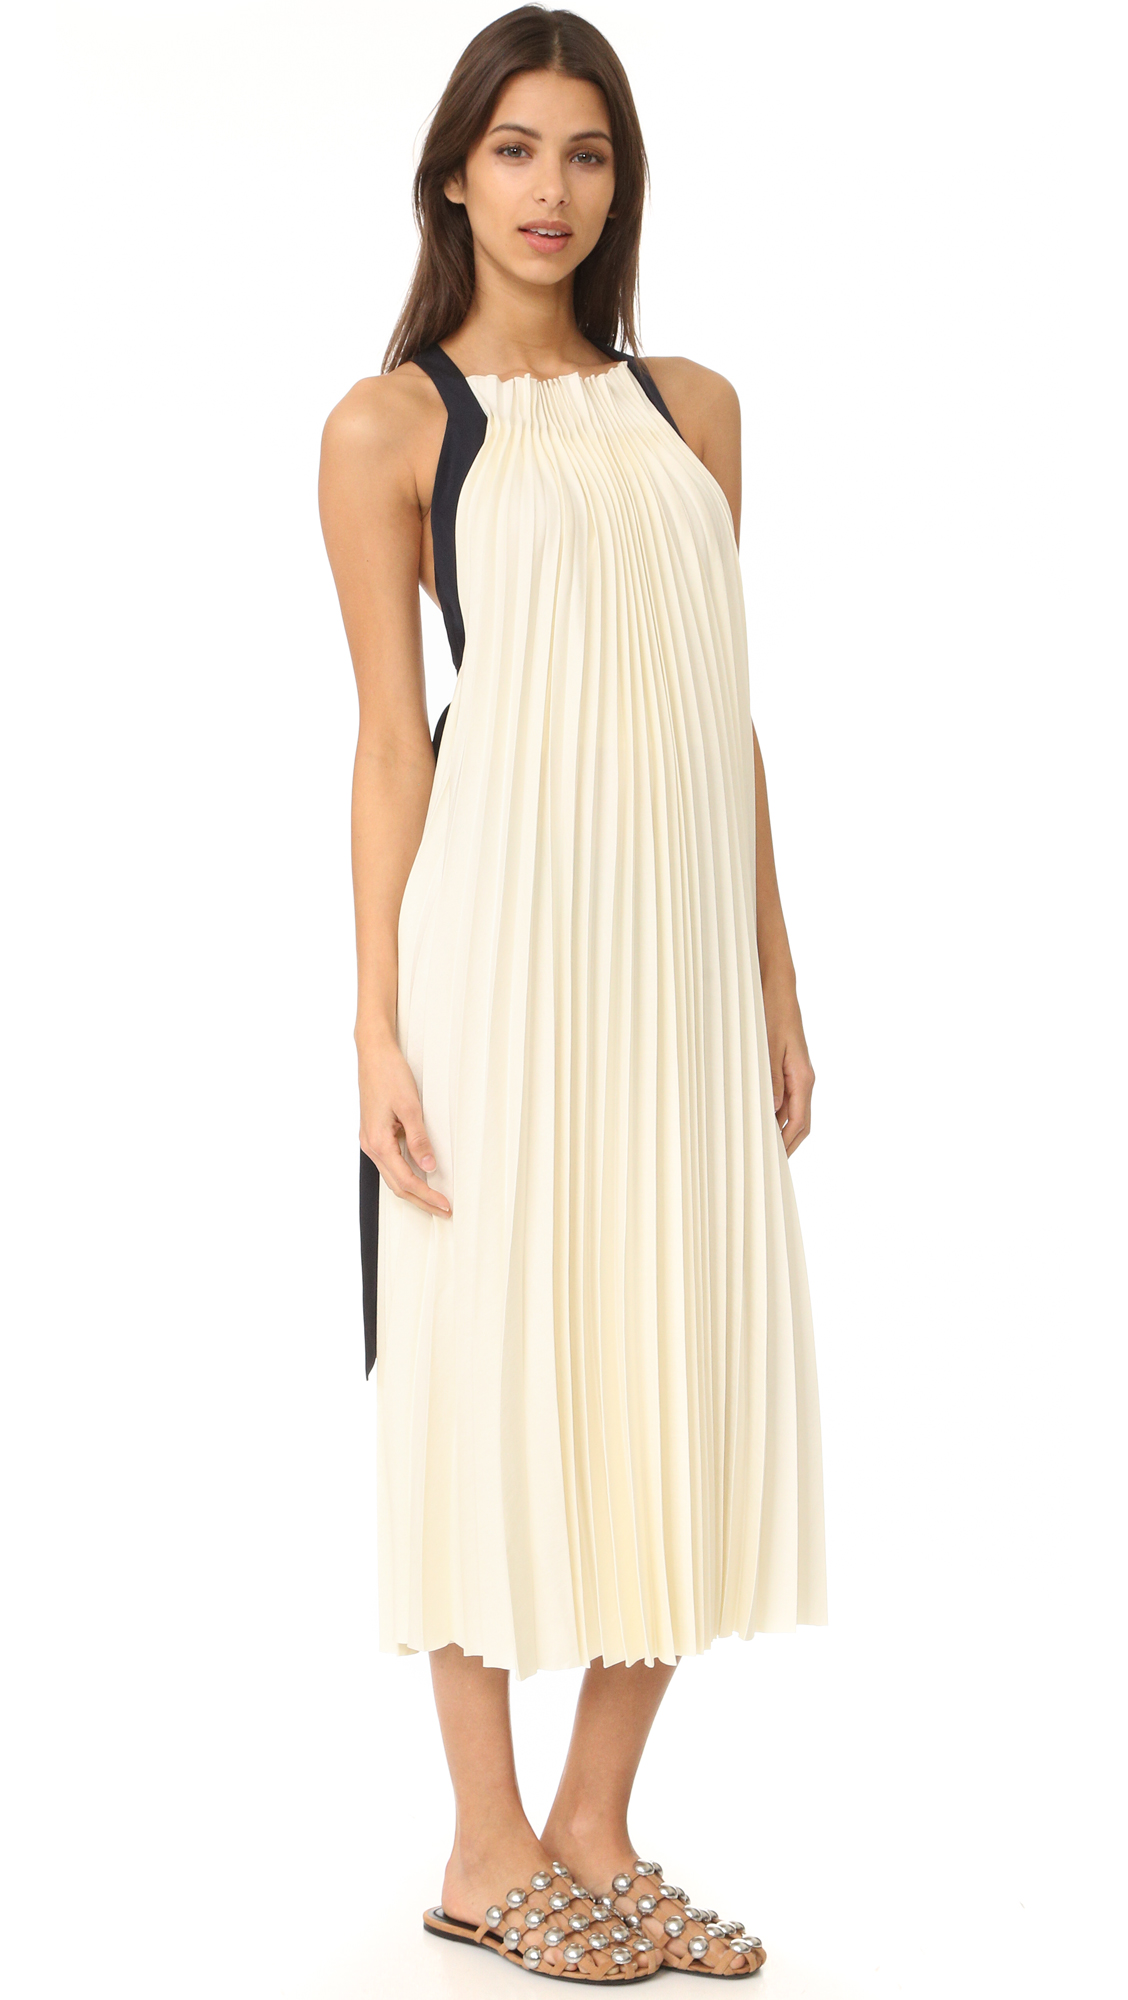 3.1 Phillip Lim Sleeveless Pleated Maxi Dress - Alabaster at Shopbop